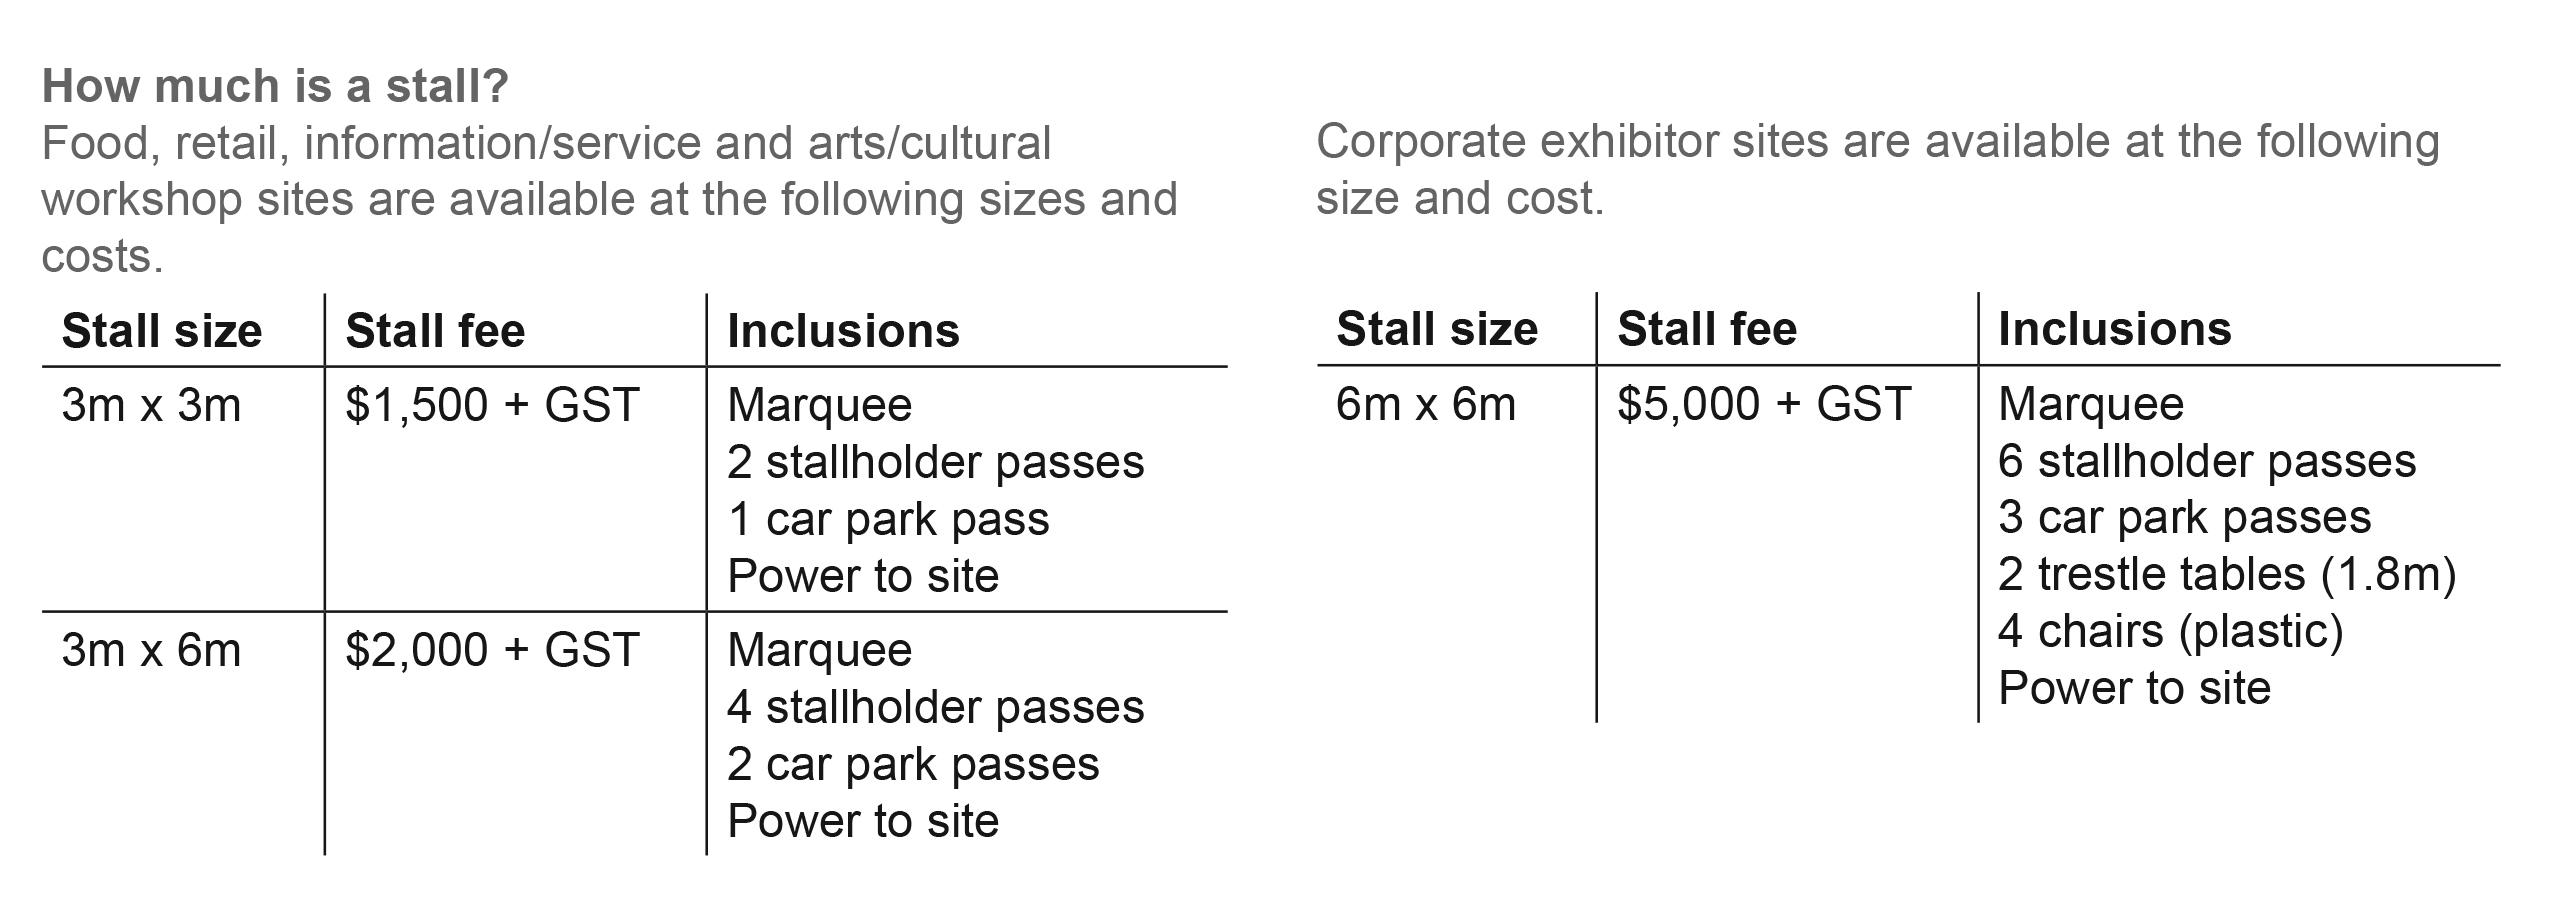 Matatini Stall info